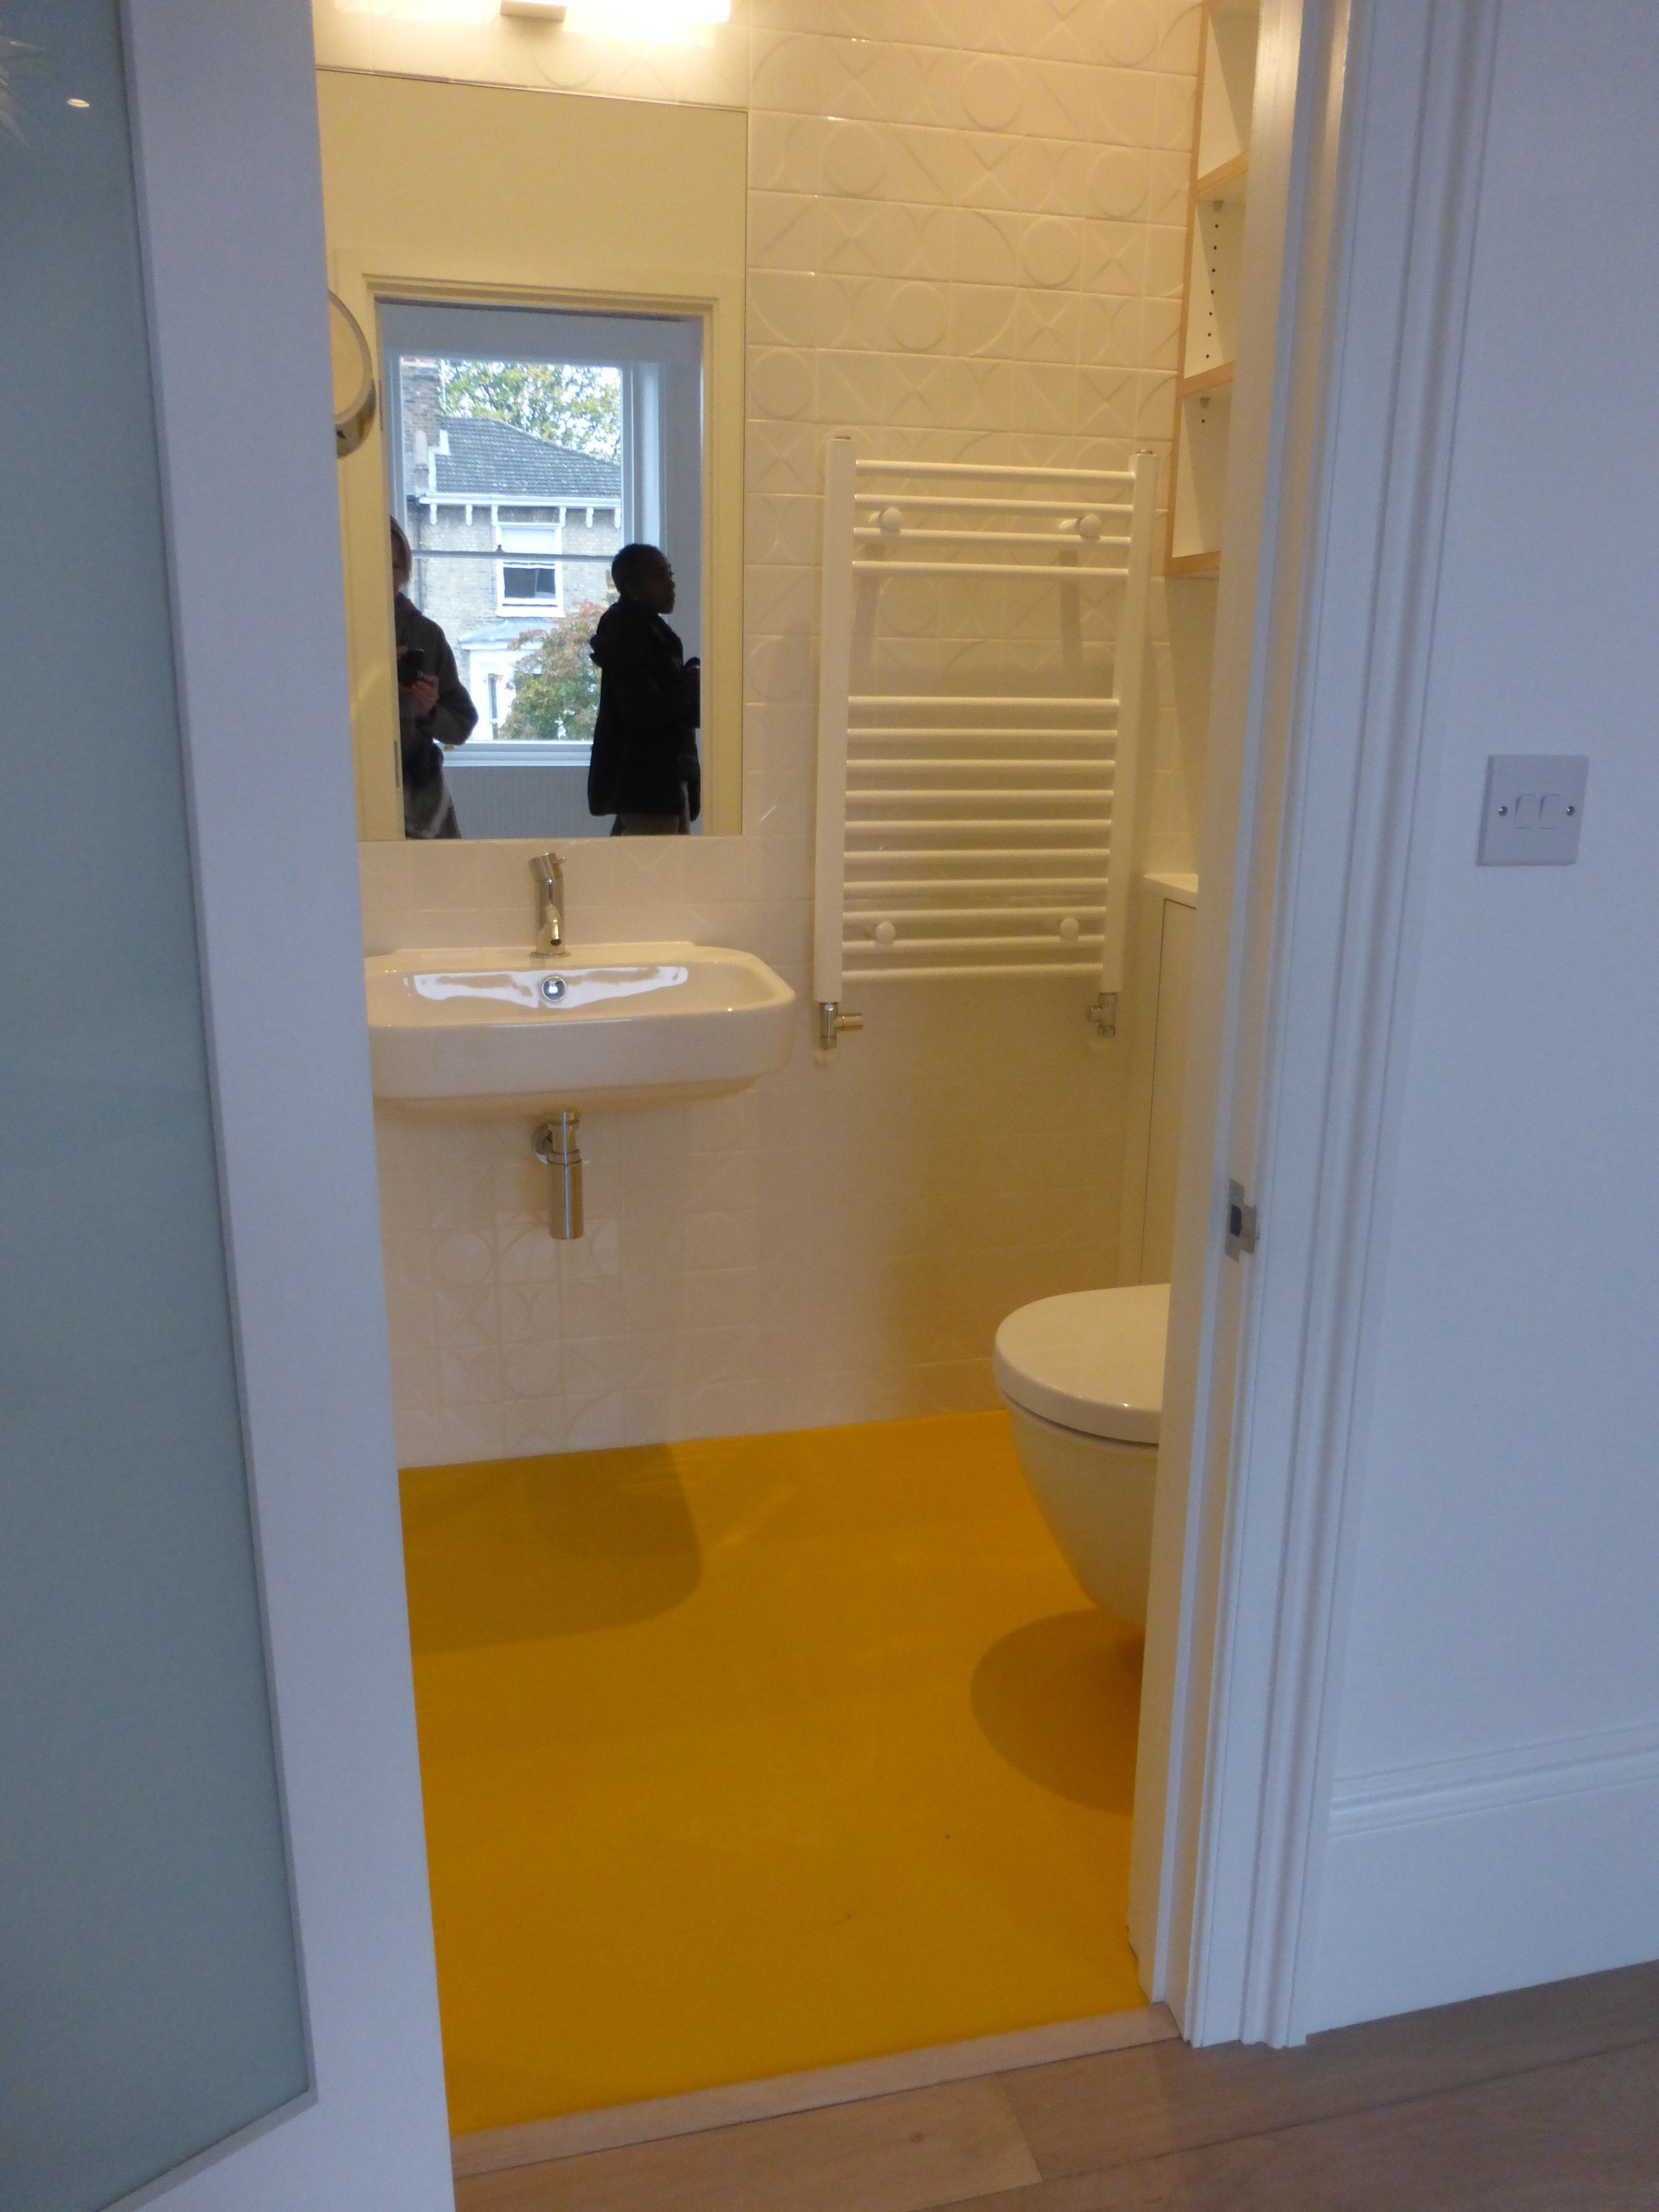 Springfield Yellow Rubber Flooring Rubber Flooring Rubber Flooring Bathroom Vinyl Laminate Flooring